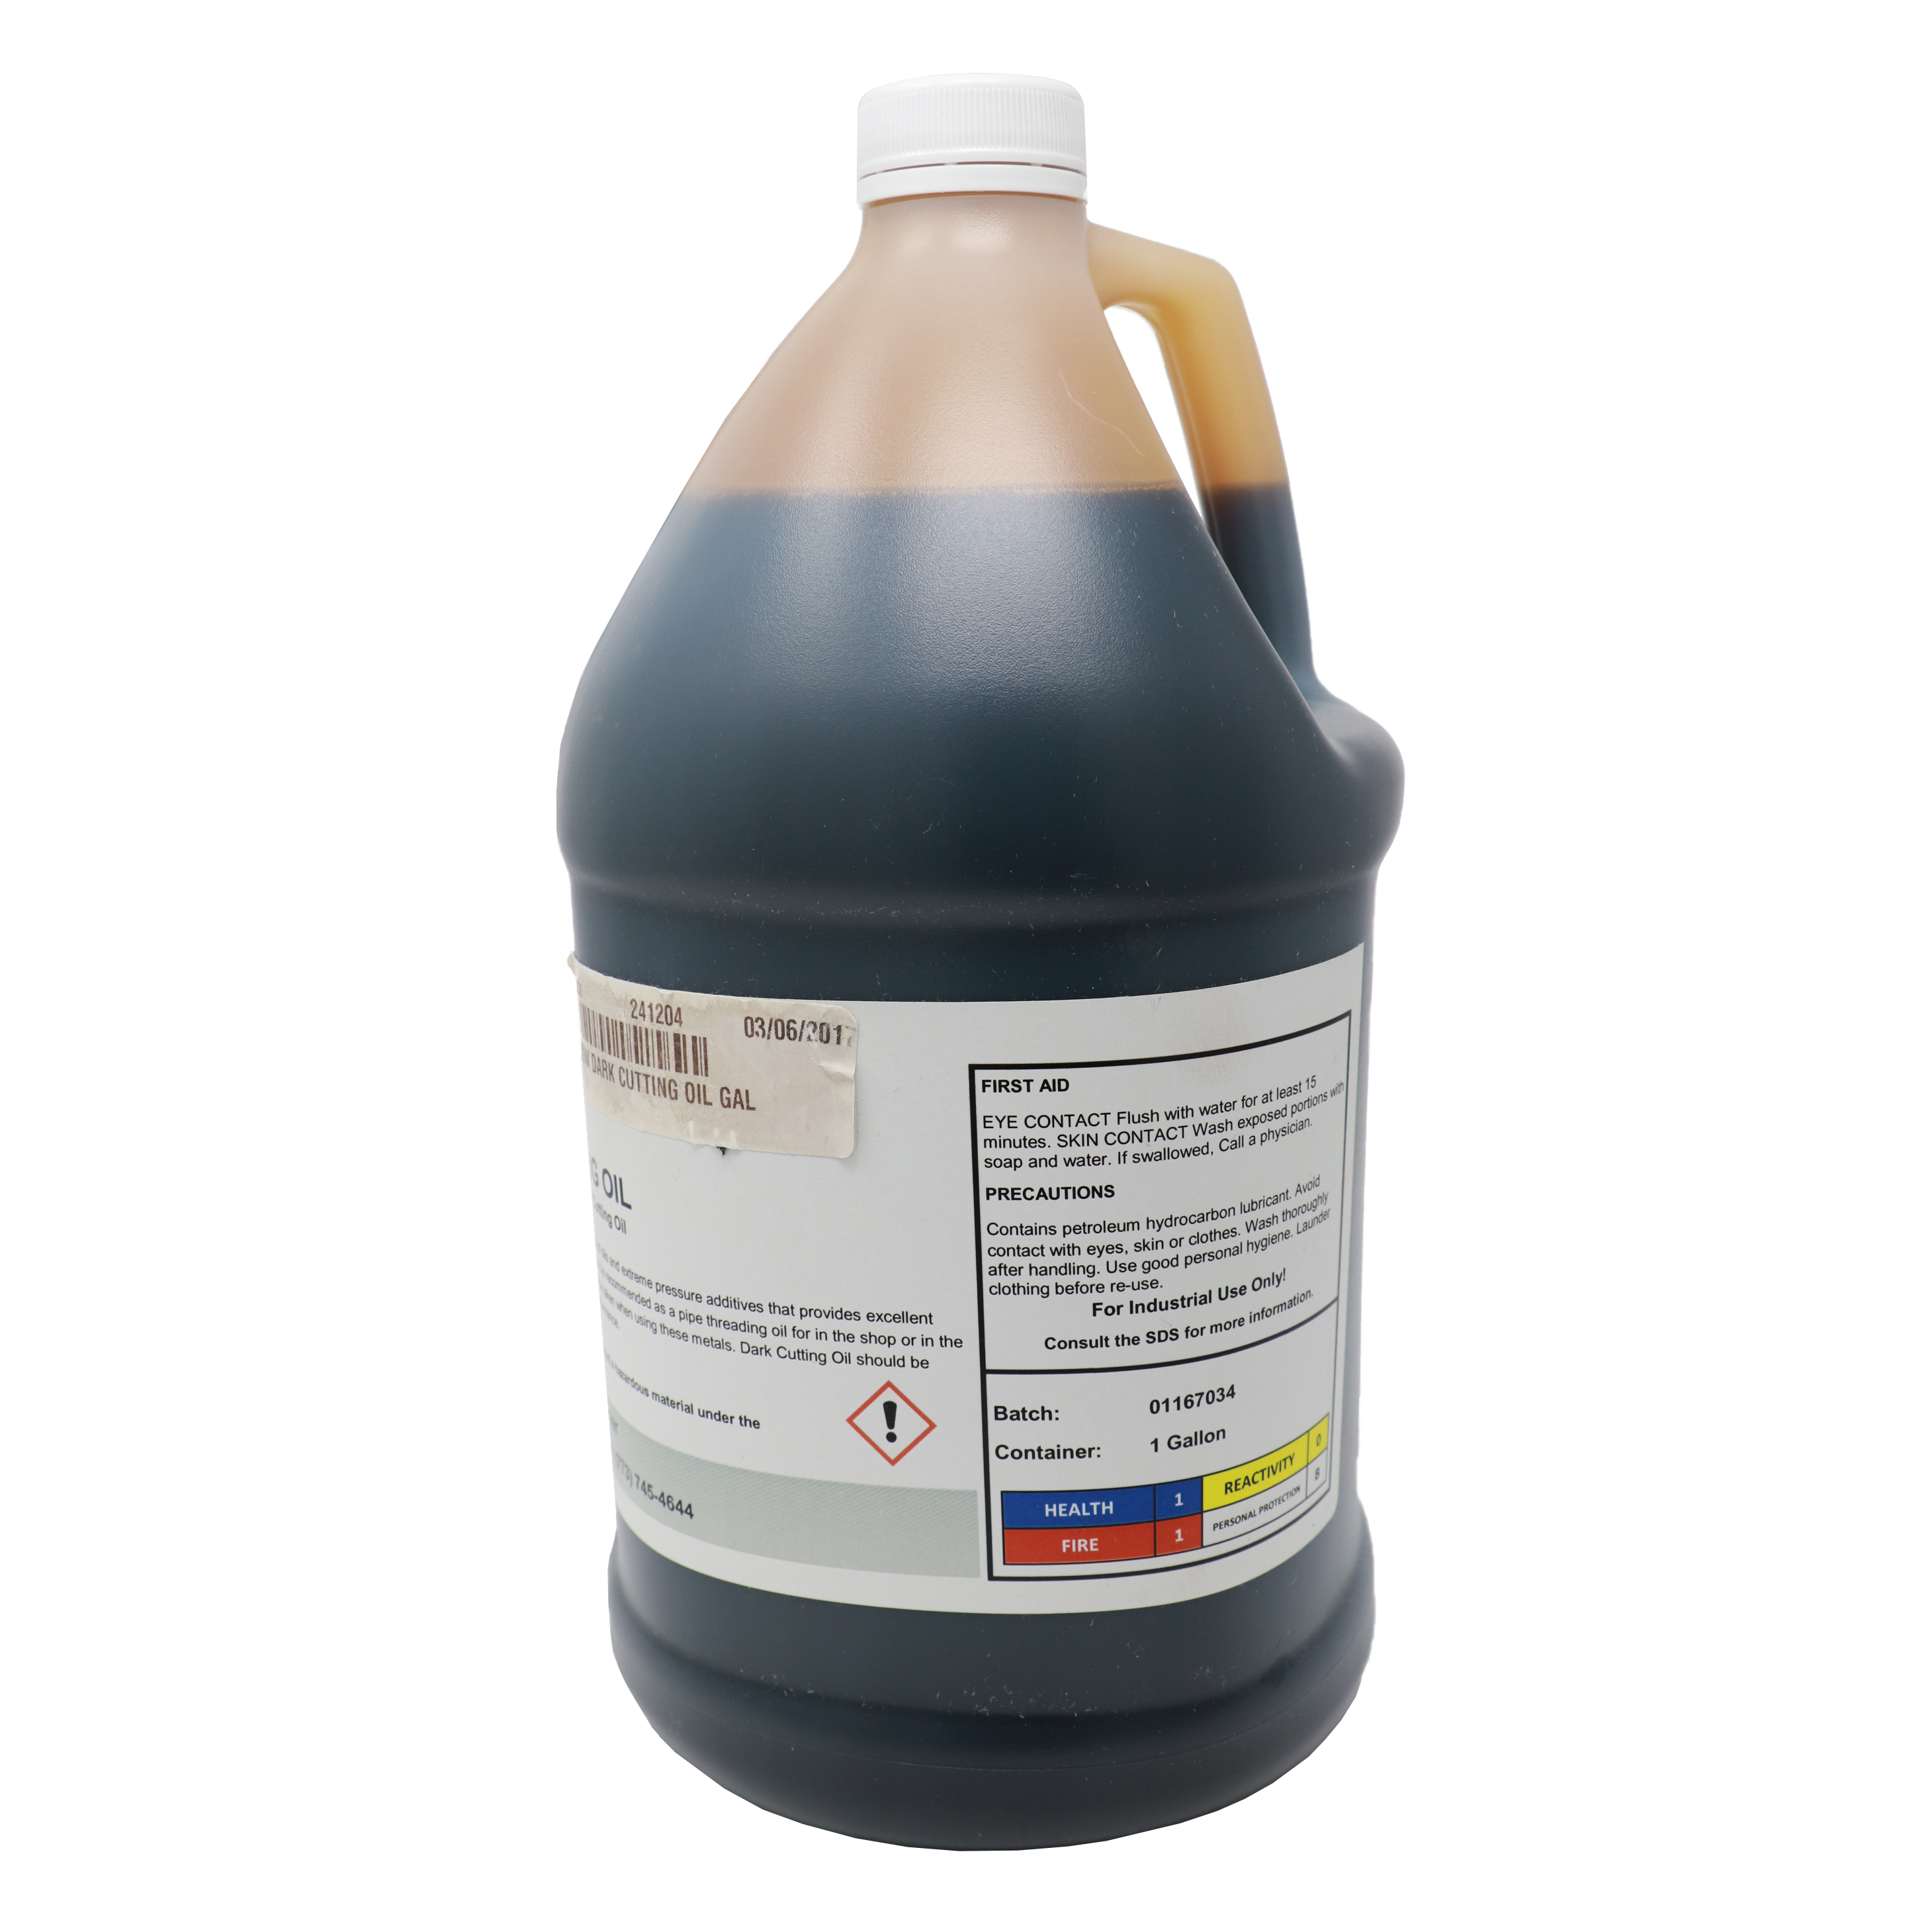 Connexion Vendor DARK-CUTTING-OIL-GAL